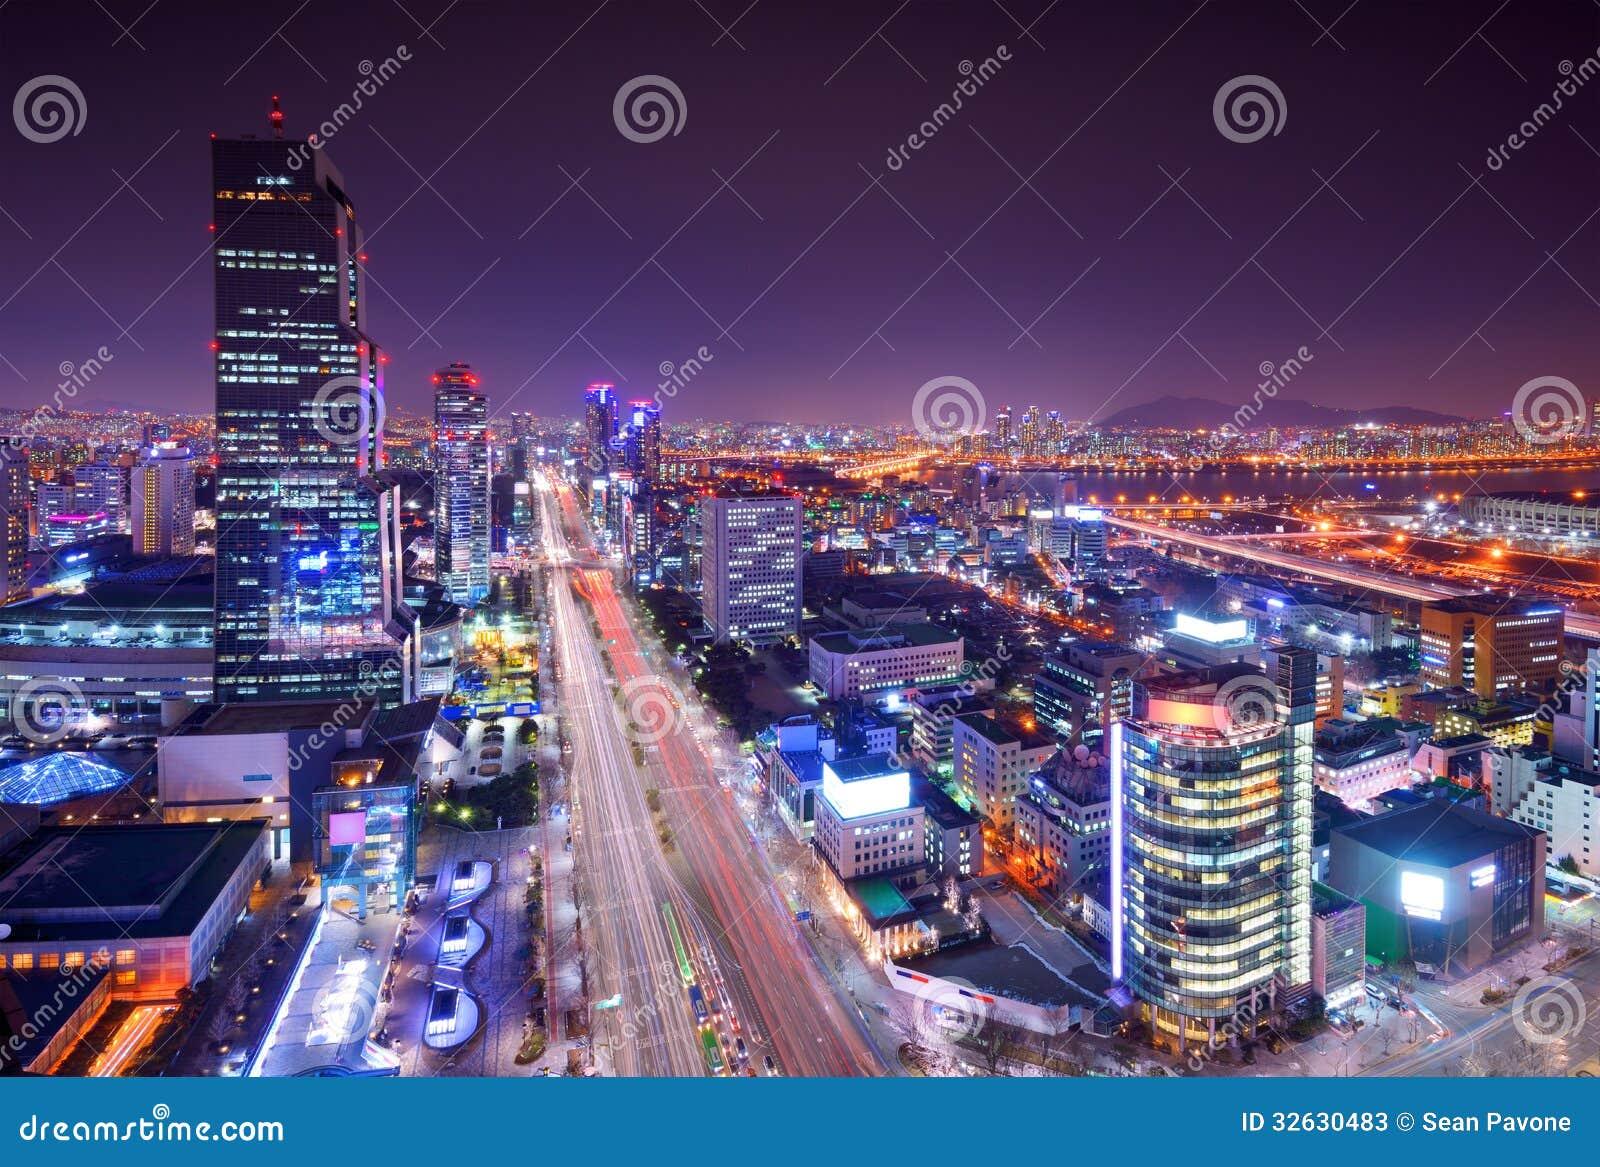 Seoul Gangnam District Skyline Stock Image - Image of ...